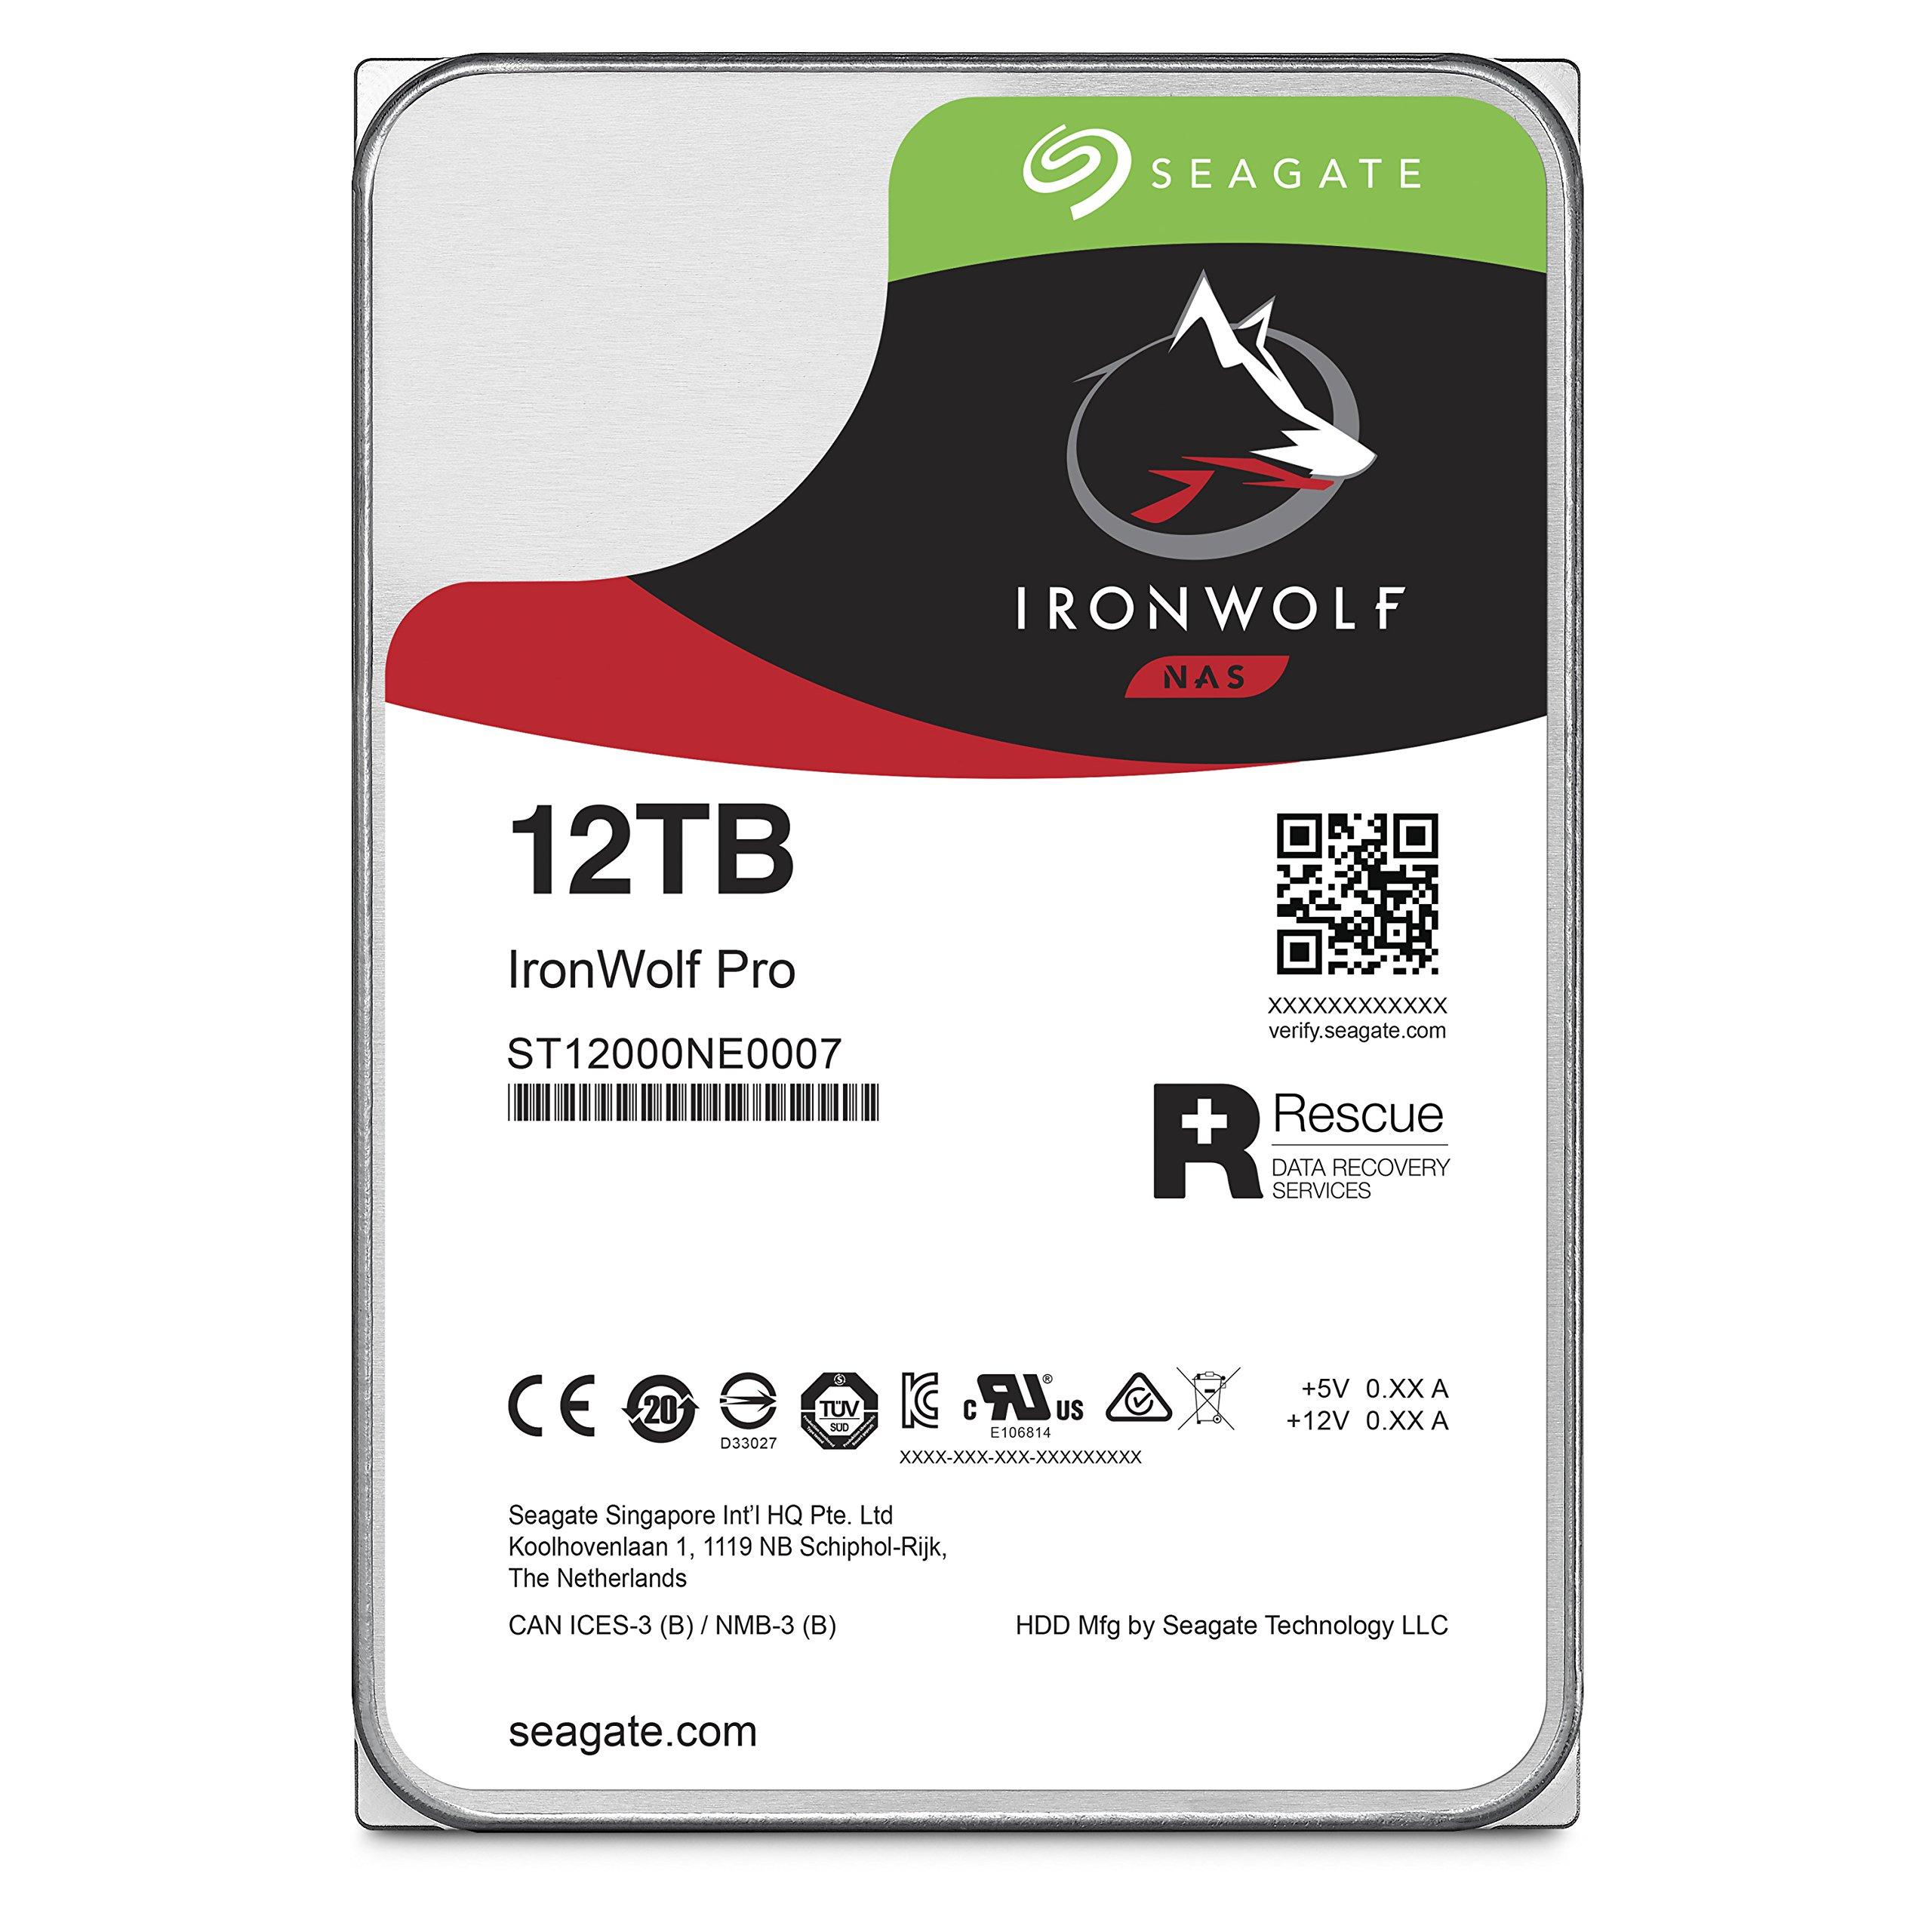 Seagate 12TB IronWolf Pro 7200RPM SATA 6Gb/s 256MB Cache 3.5-Inch NAS Hard Disk Drive 3.5-Inch Internal Bare/OEM Drive ST12000NE0007